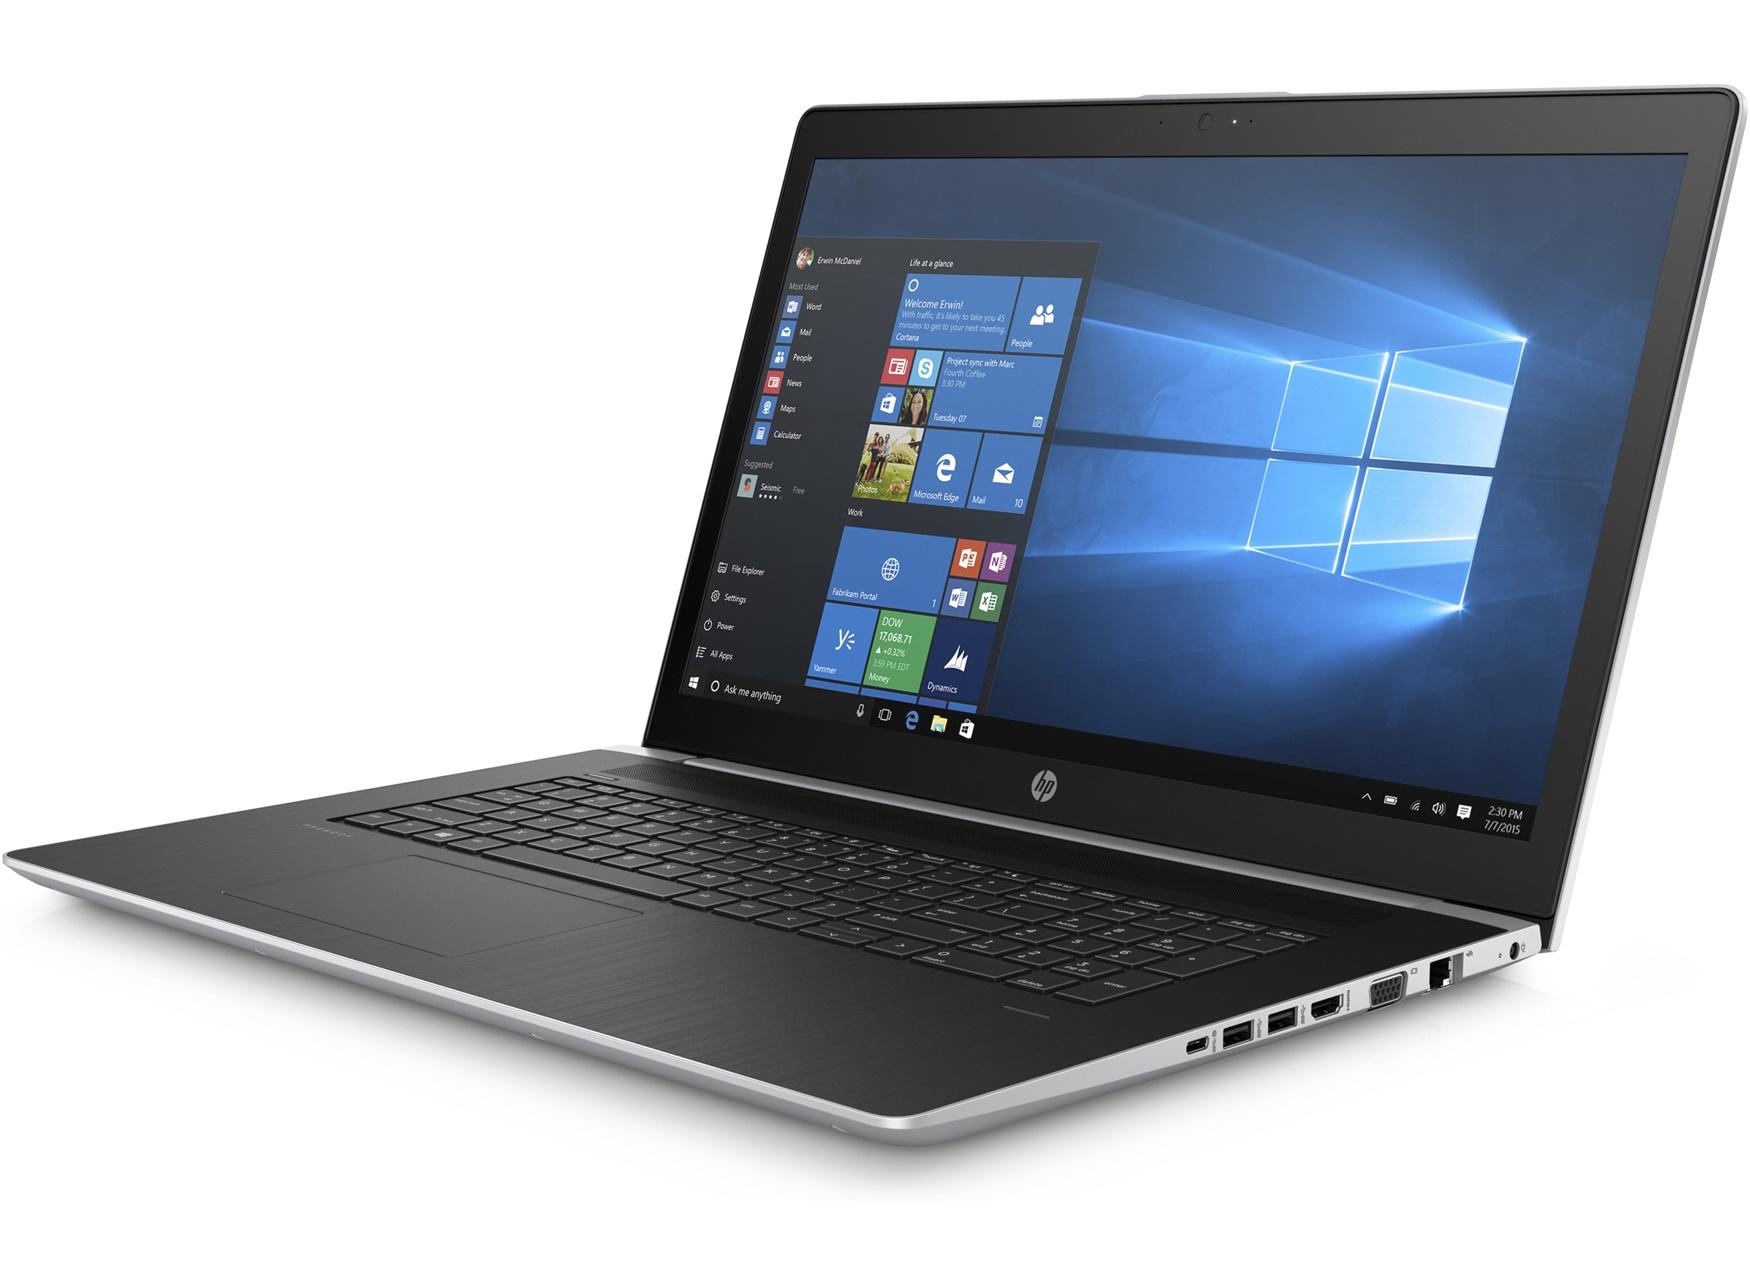 HP Probook BIOS Key